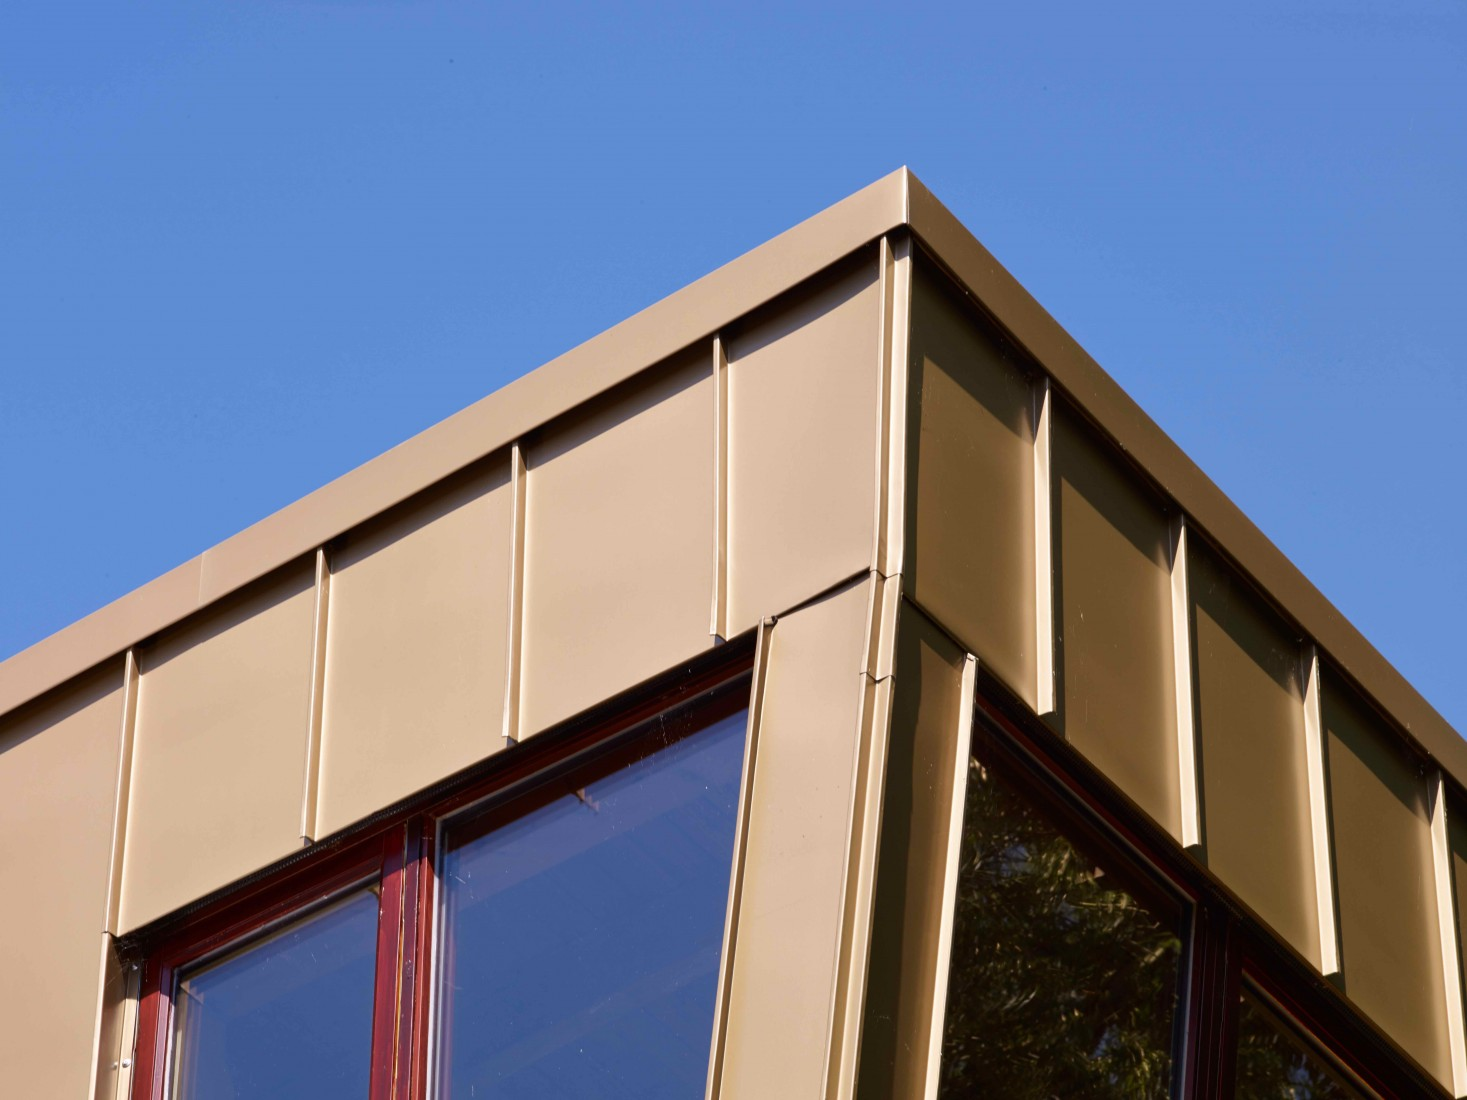 Winkelstehfalzbleche an der Fassade. Foto: Rheinzink